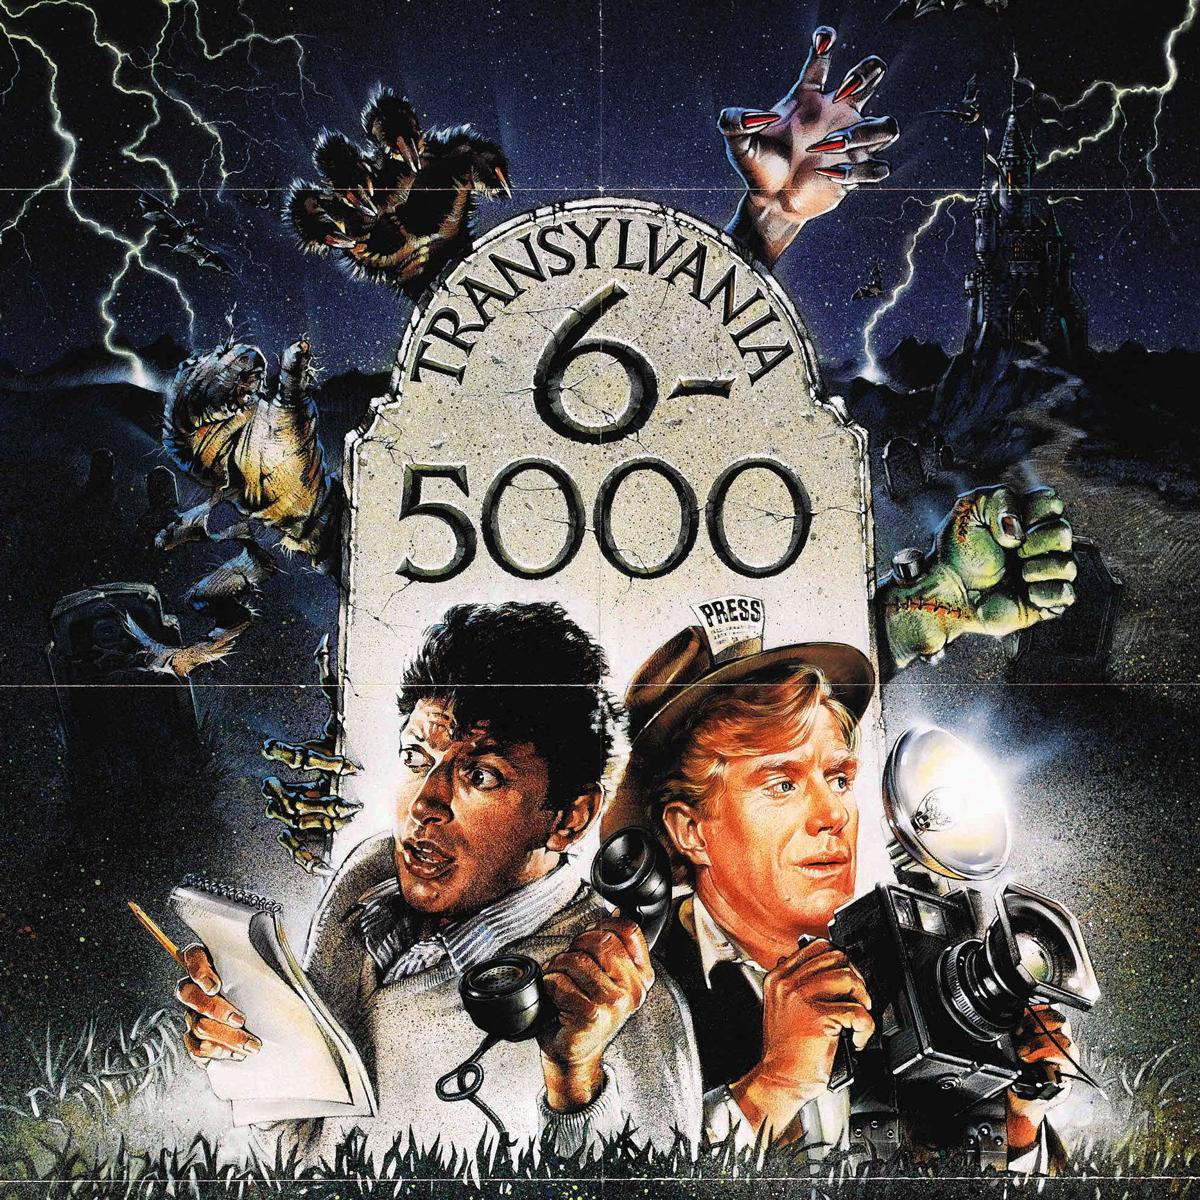 ISTYA Transylvania 6500